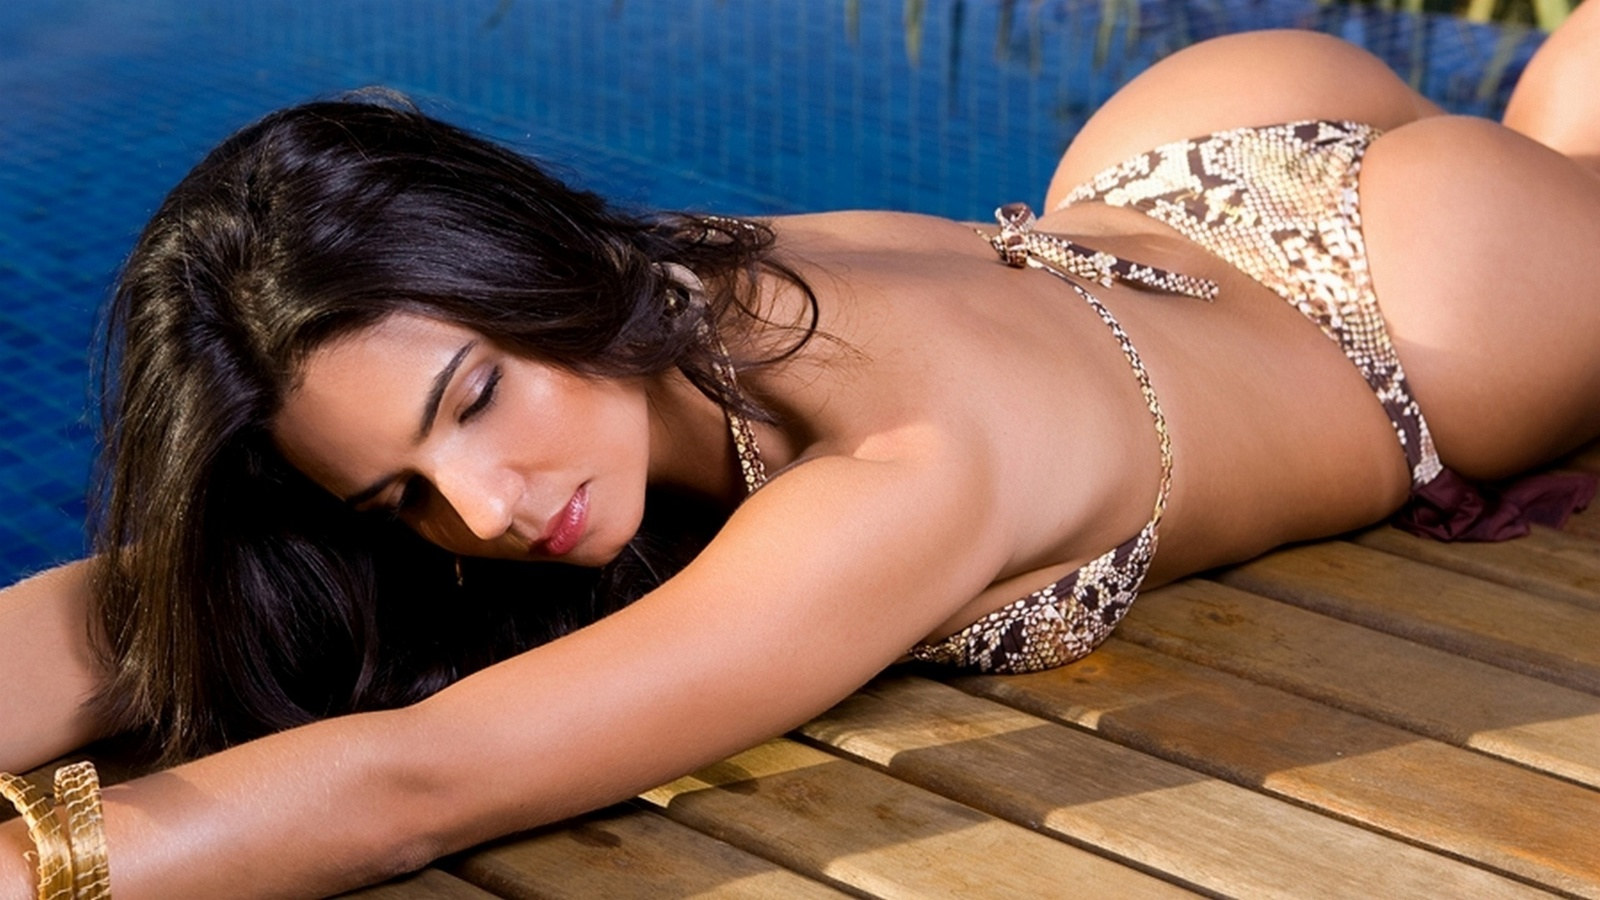 sexy-sexy-vagina-image-bikini-video-download-moynahan